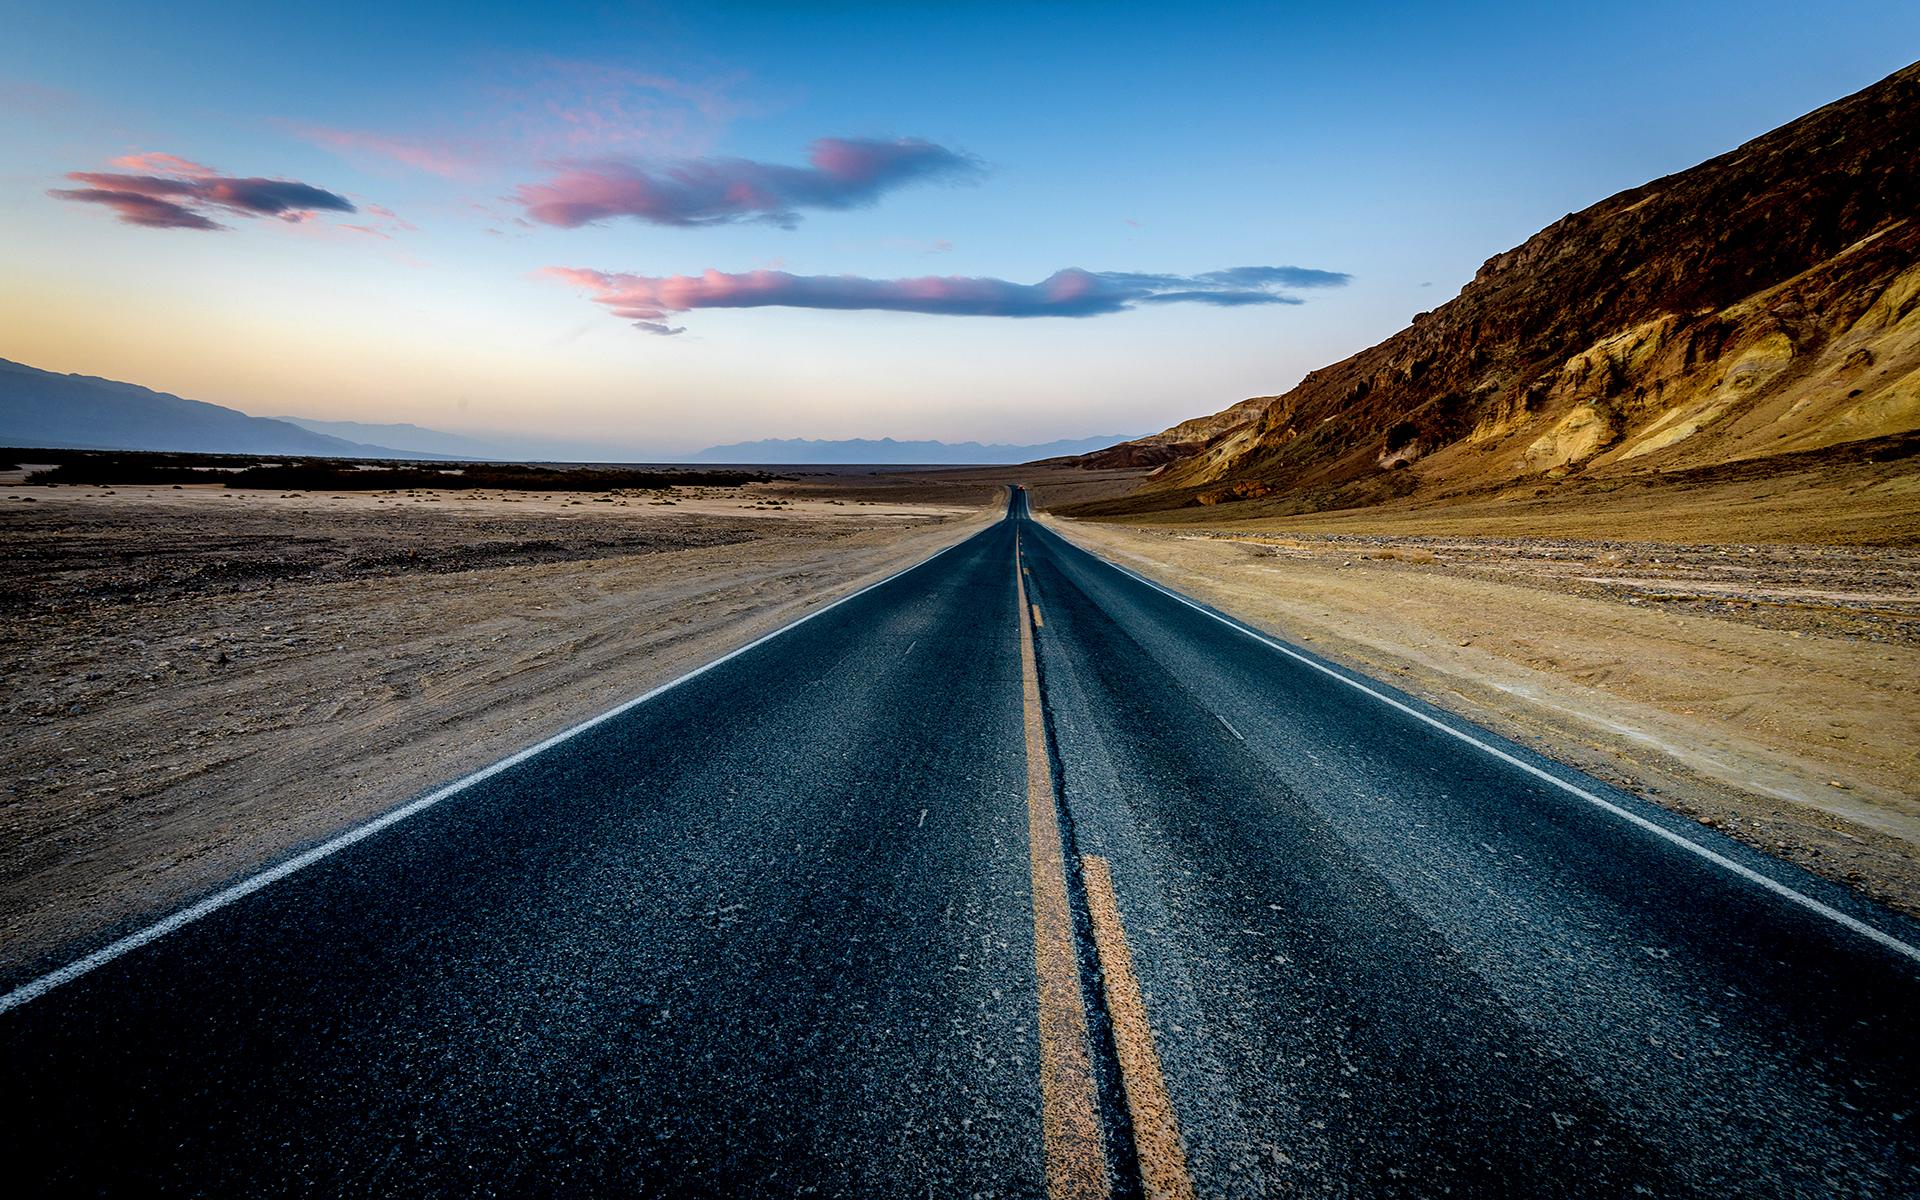 Sunlight Landscape Sunset Sea Sand Sky Road Sunrise Evening Morning Coast Desert Horizon Highway Dusk Asphalt